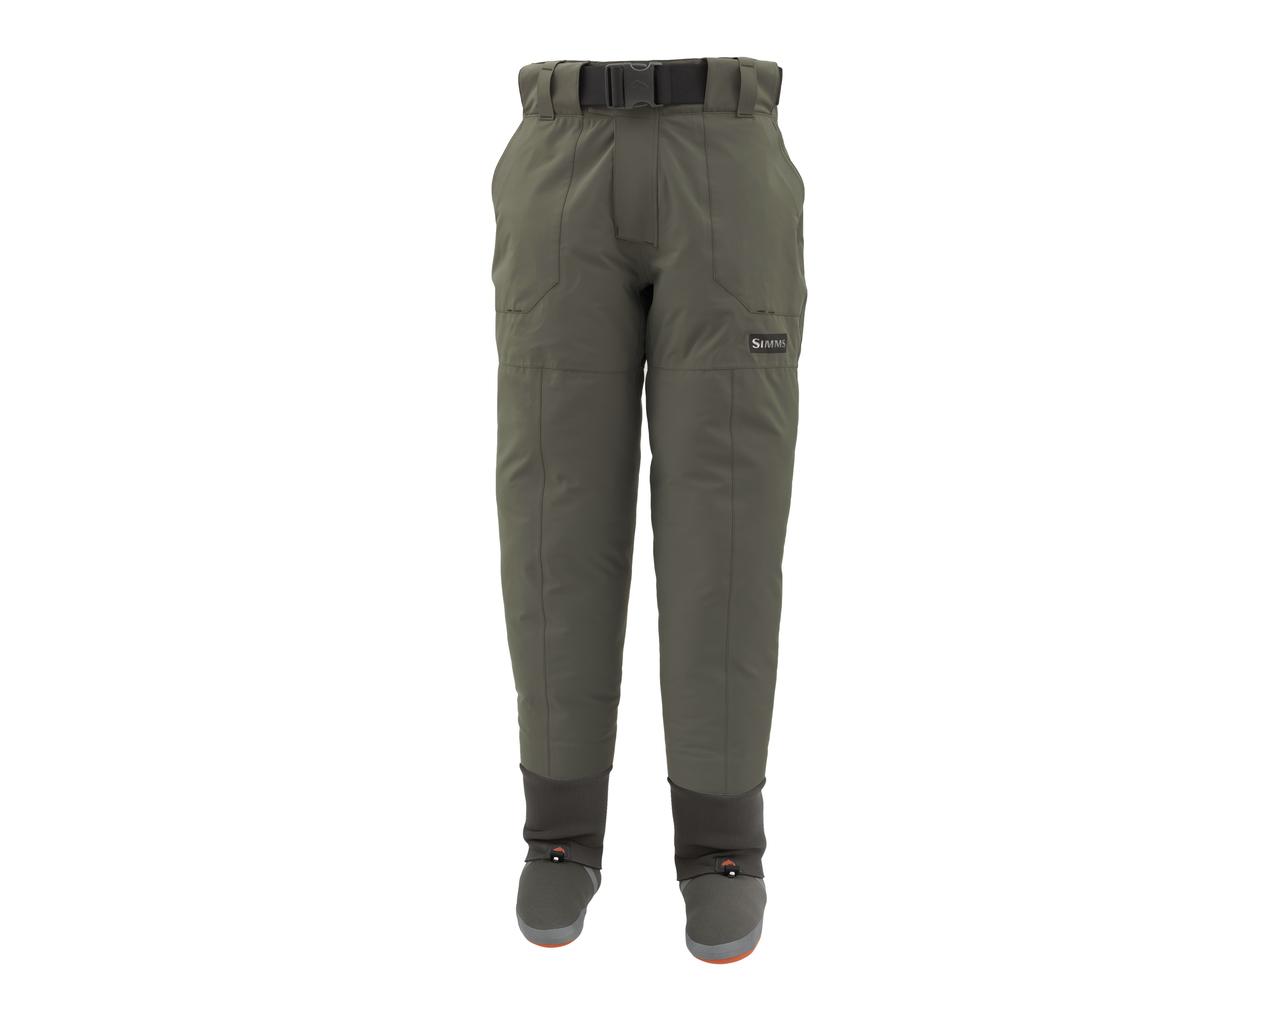 Pantalon Waders Simms - Freestone Pant - Taille S